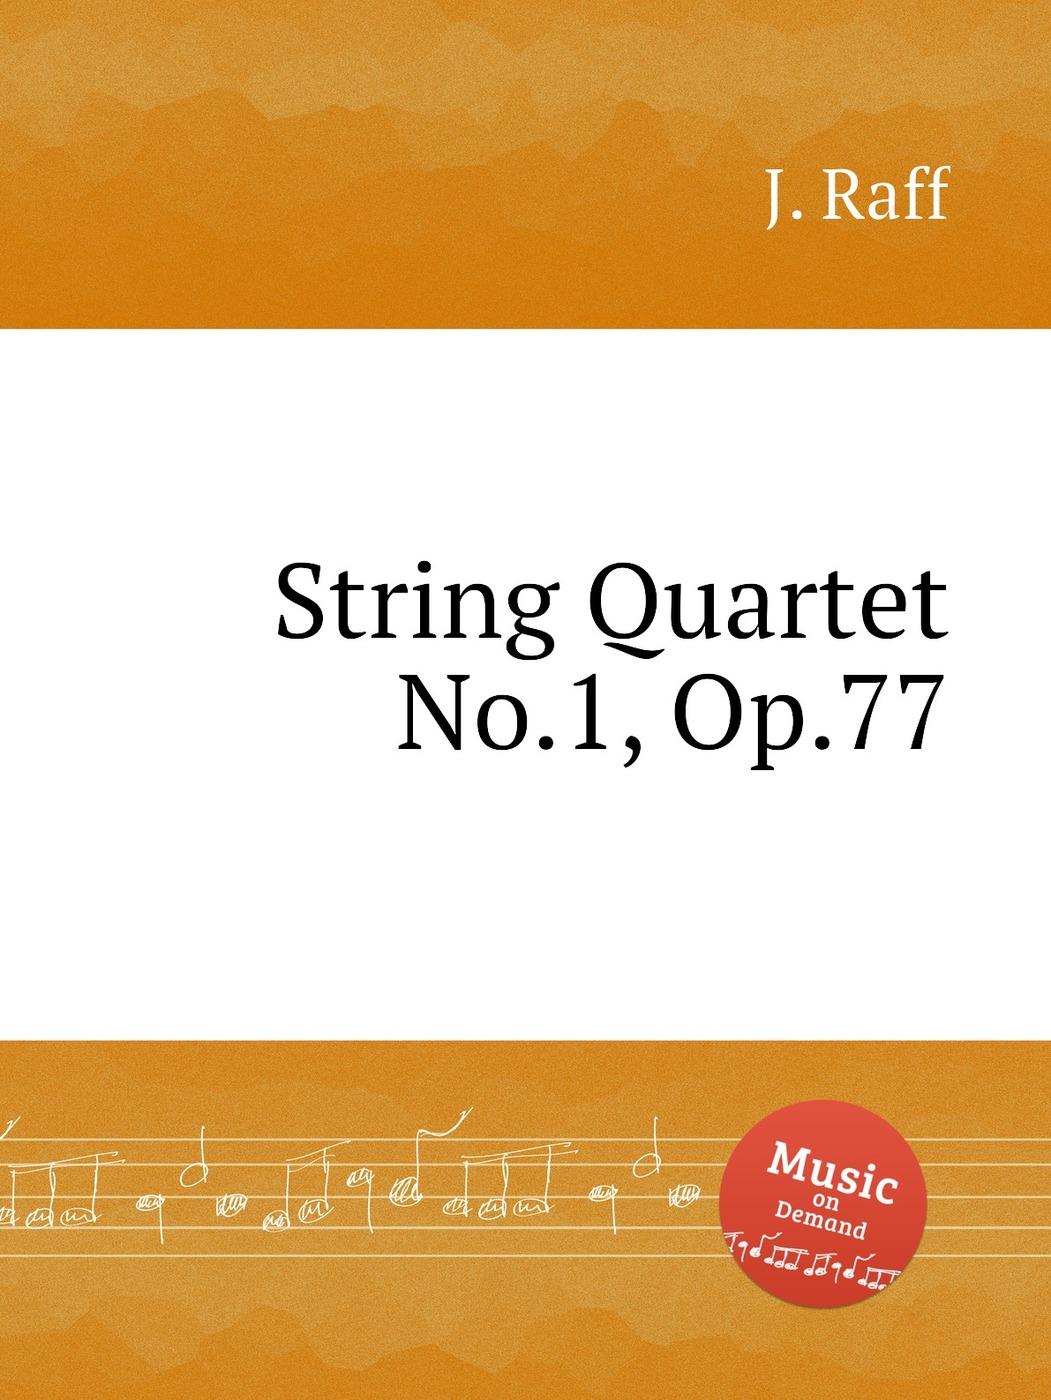 String Quartet No.1, Op.77